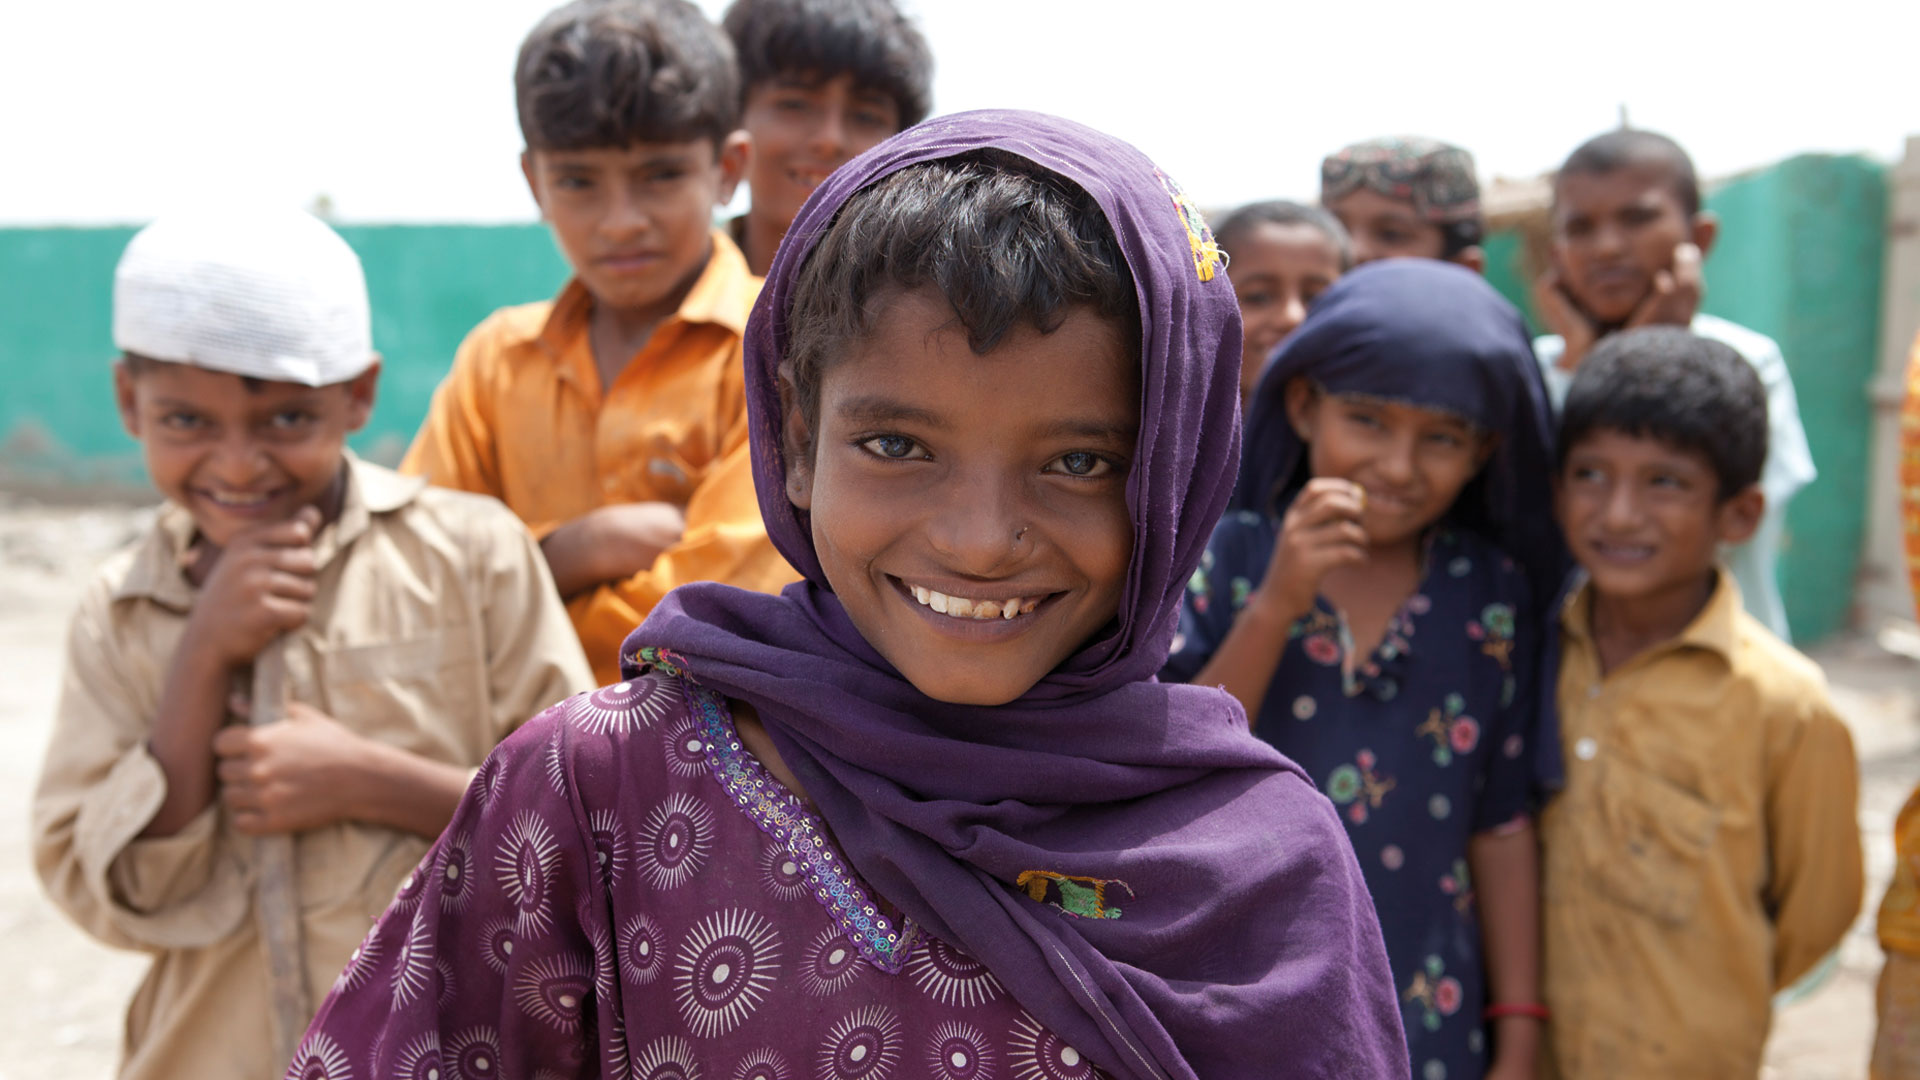 Jungs in Pakistan